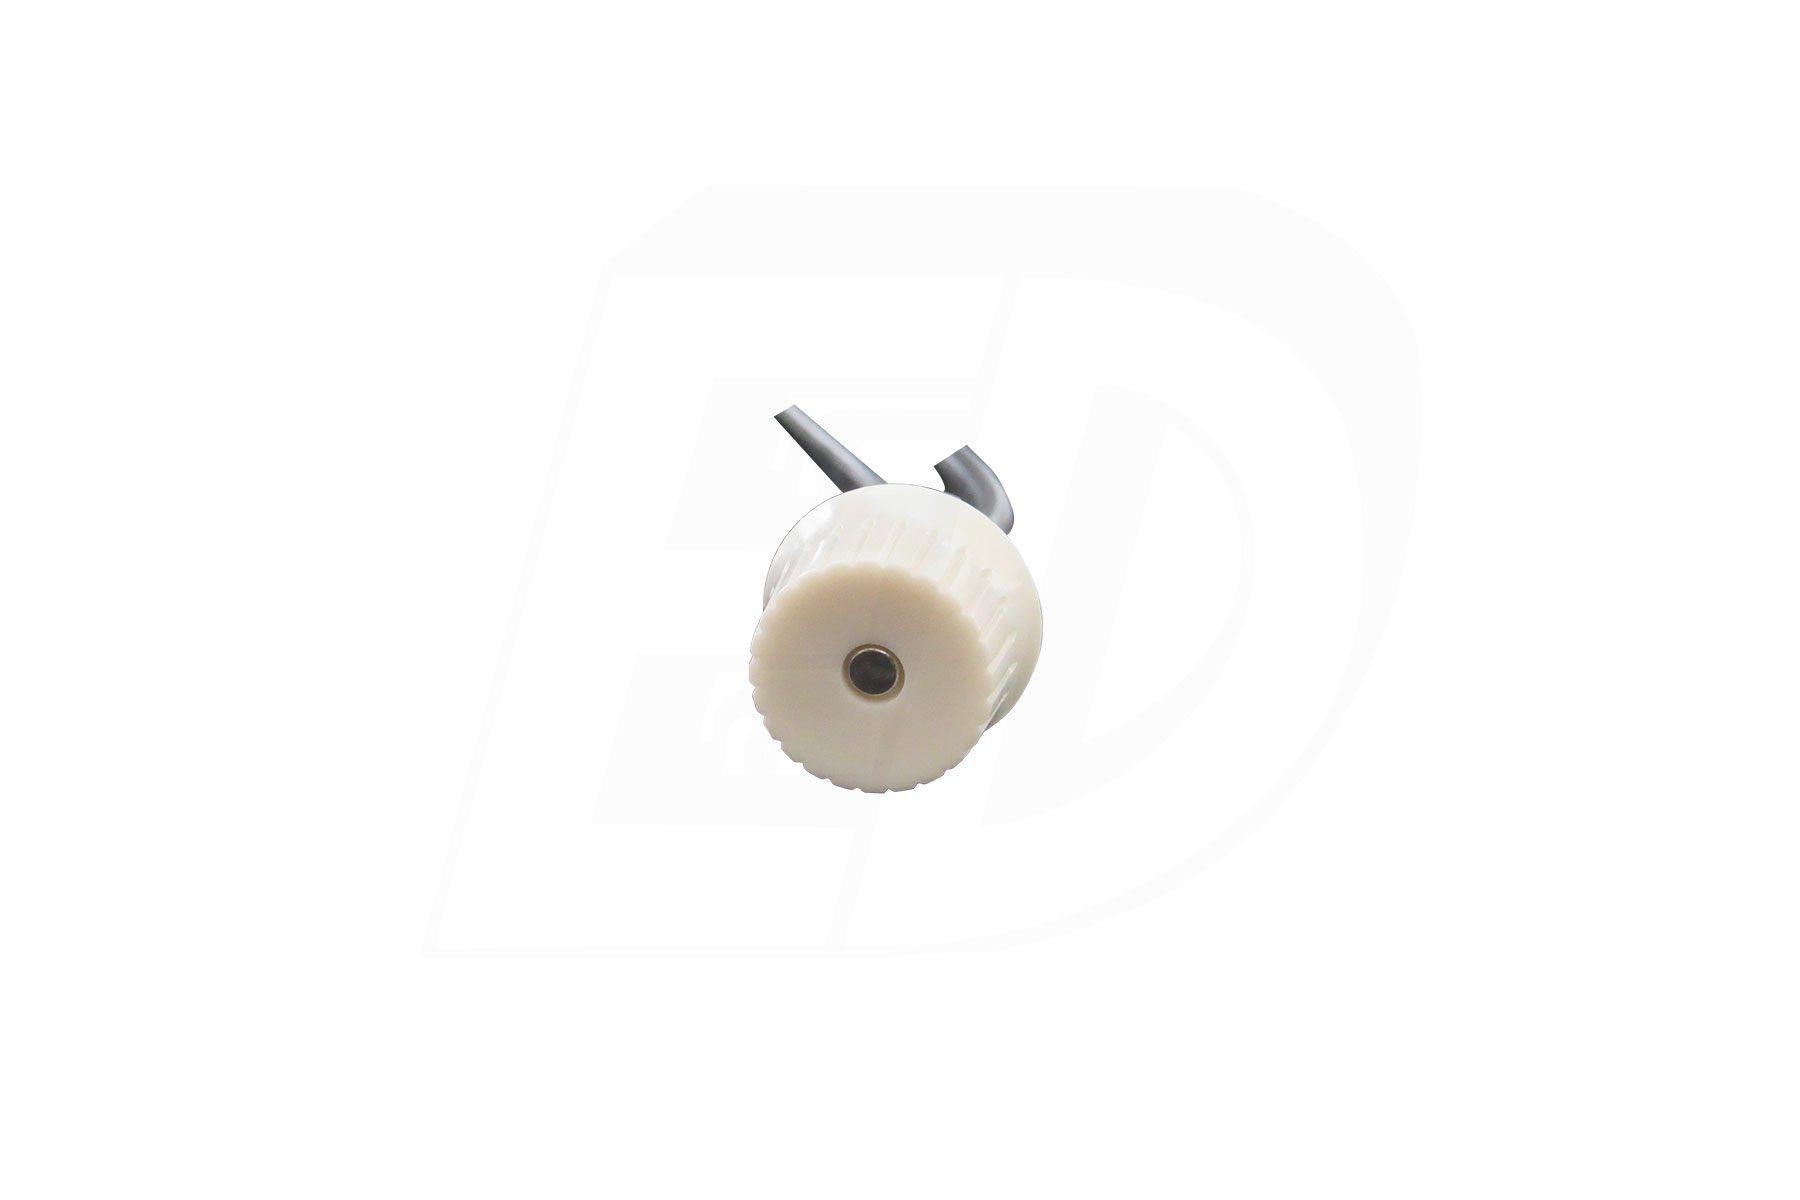 SPST Rotary Knob Lamp Switch